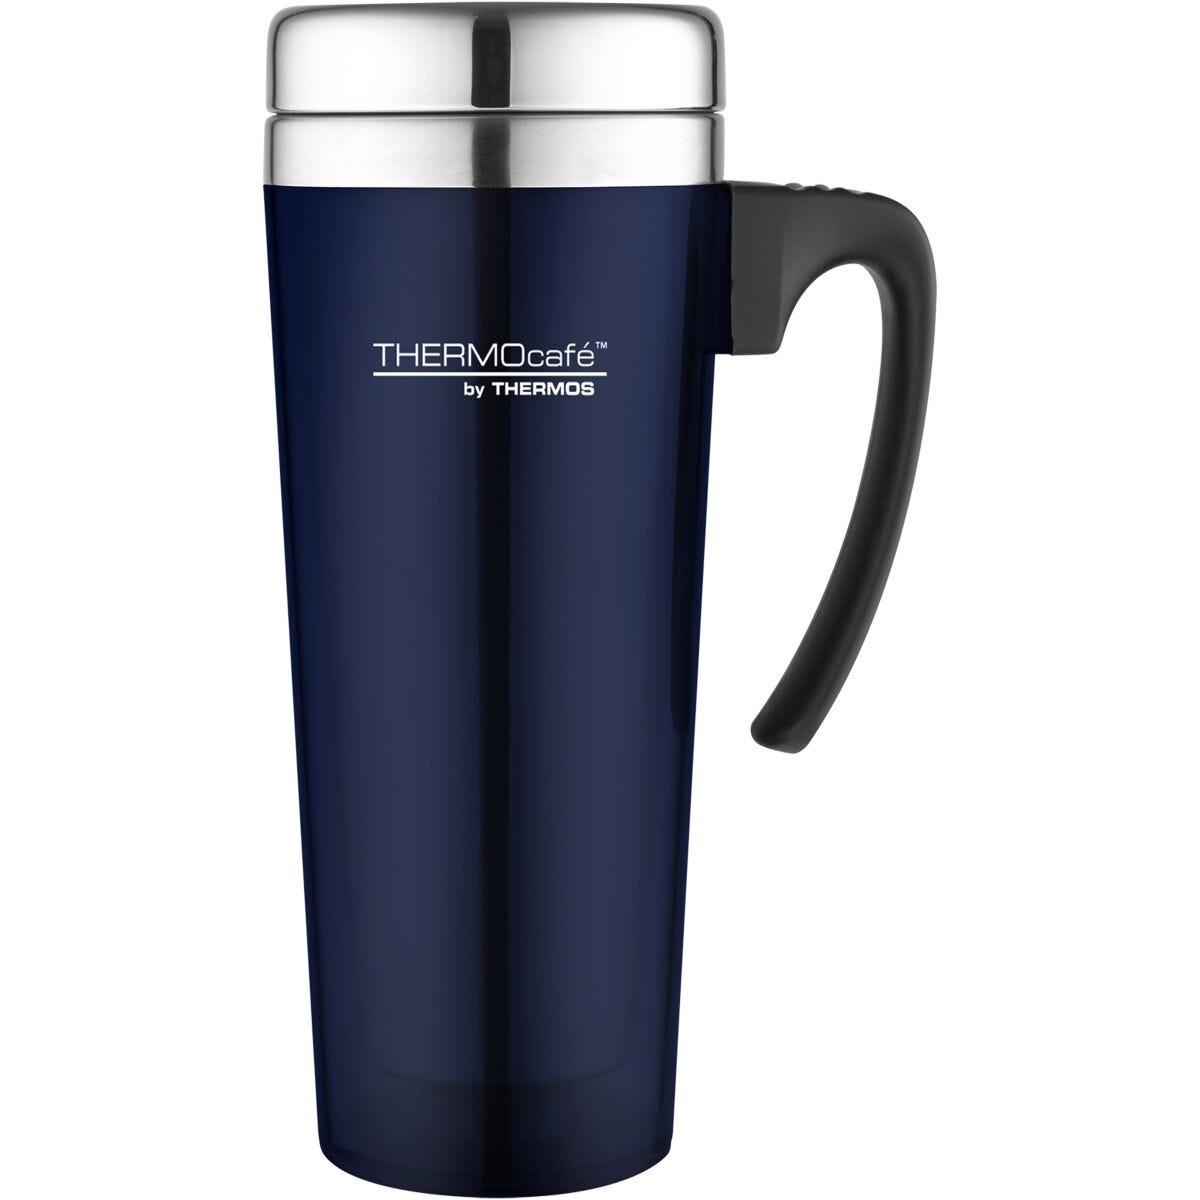 ThermoCafe Thermos Translucent Travel Mug 420ml